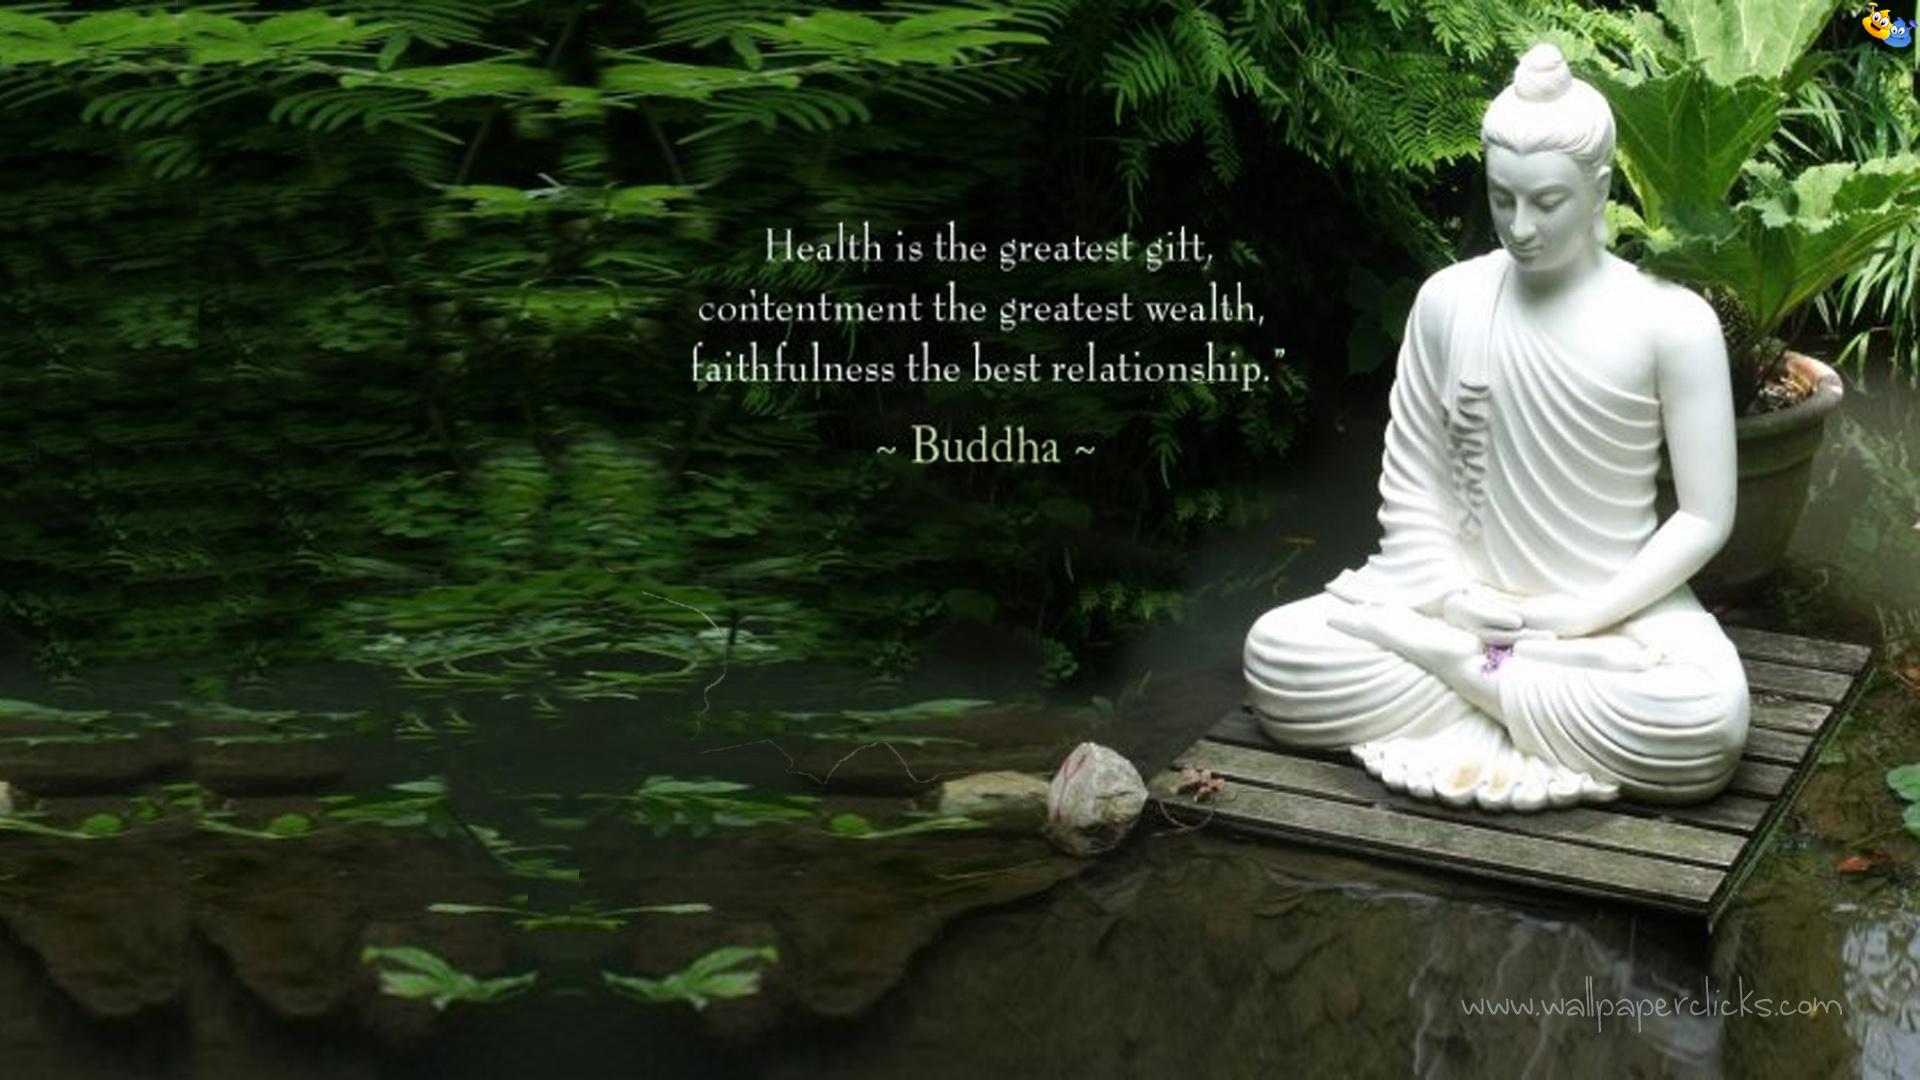 Lord Buddha Wallpaper HD - WallpaperSafari